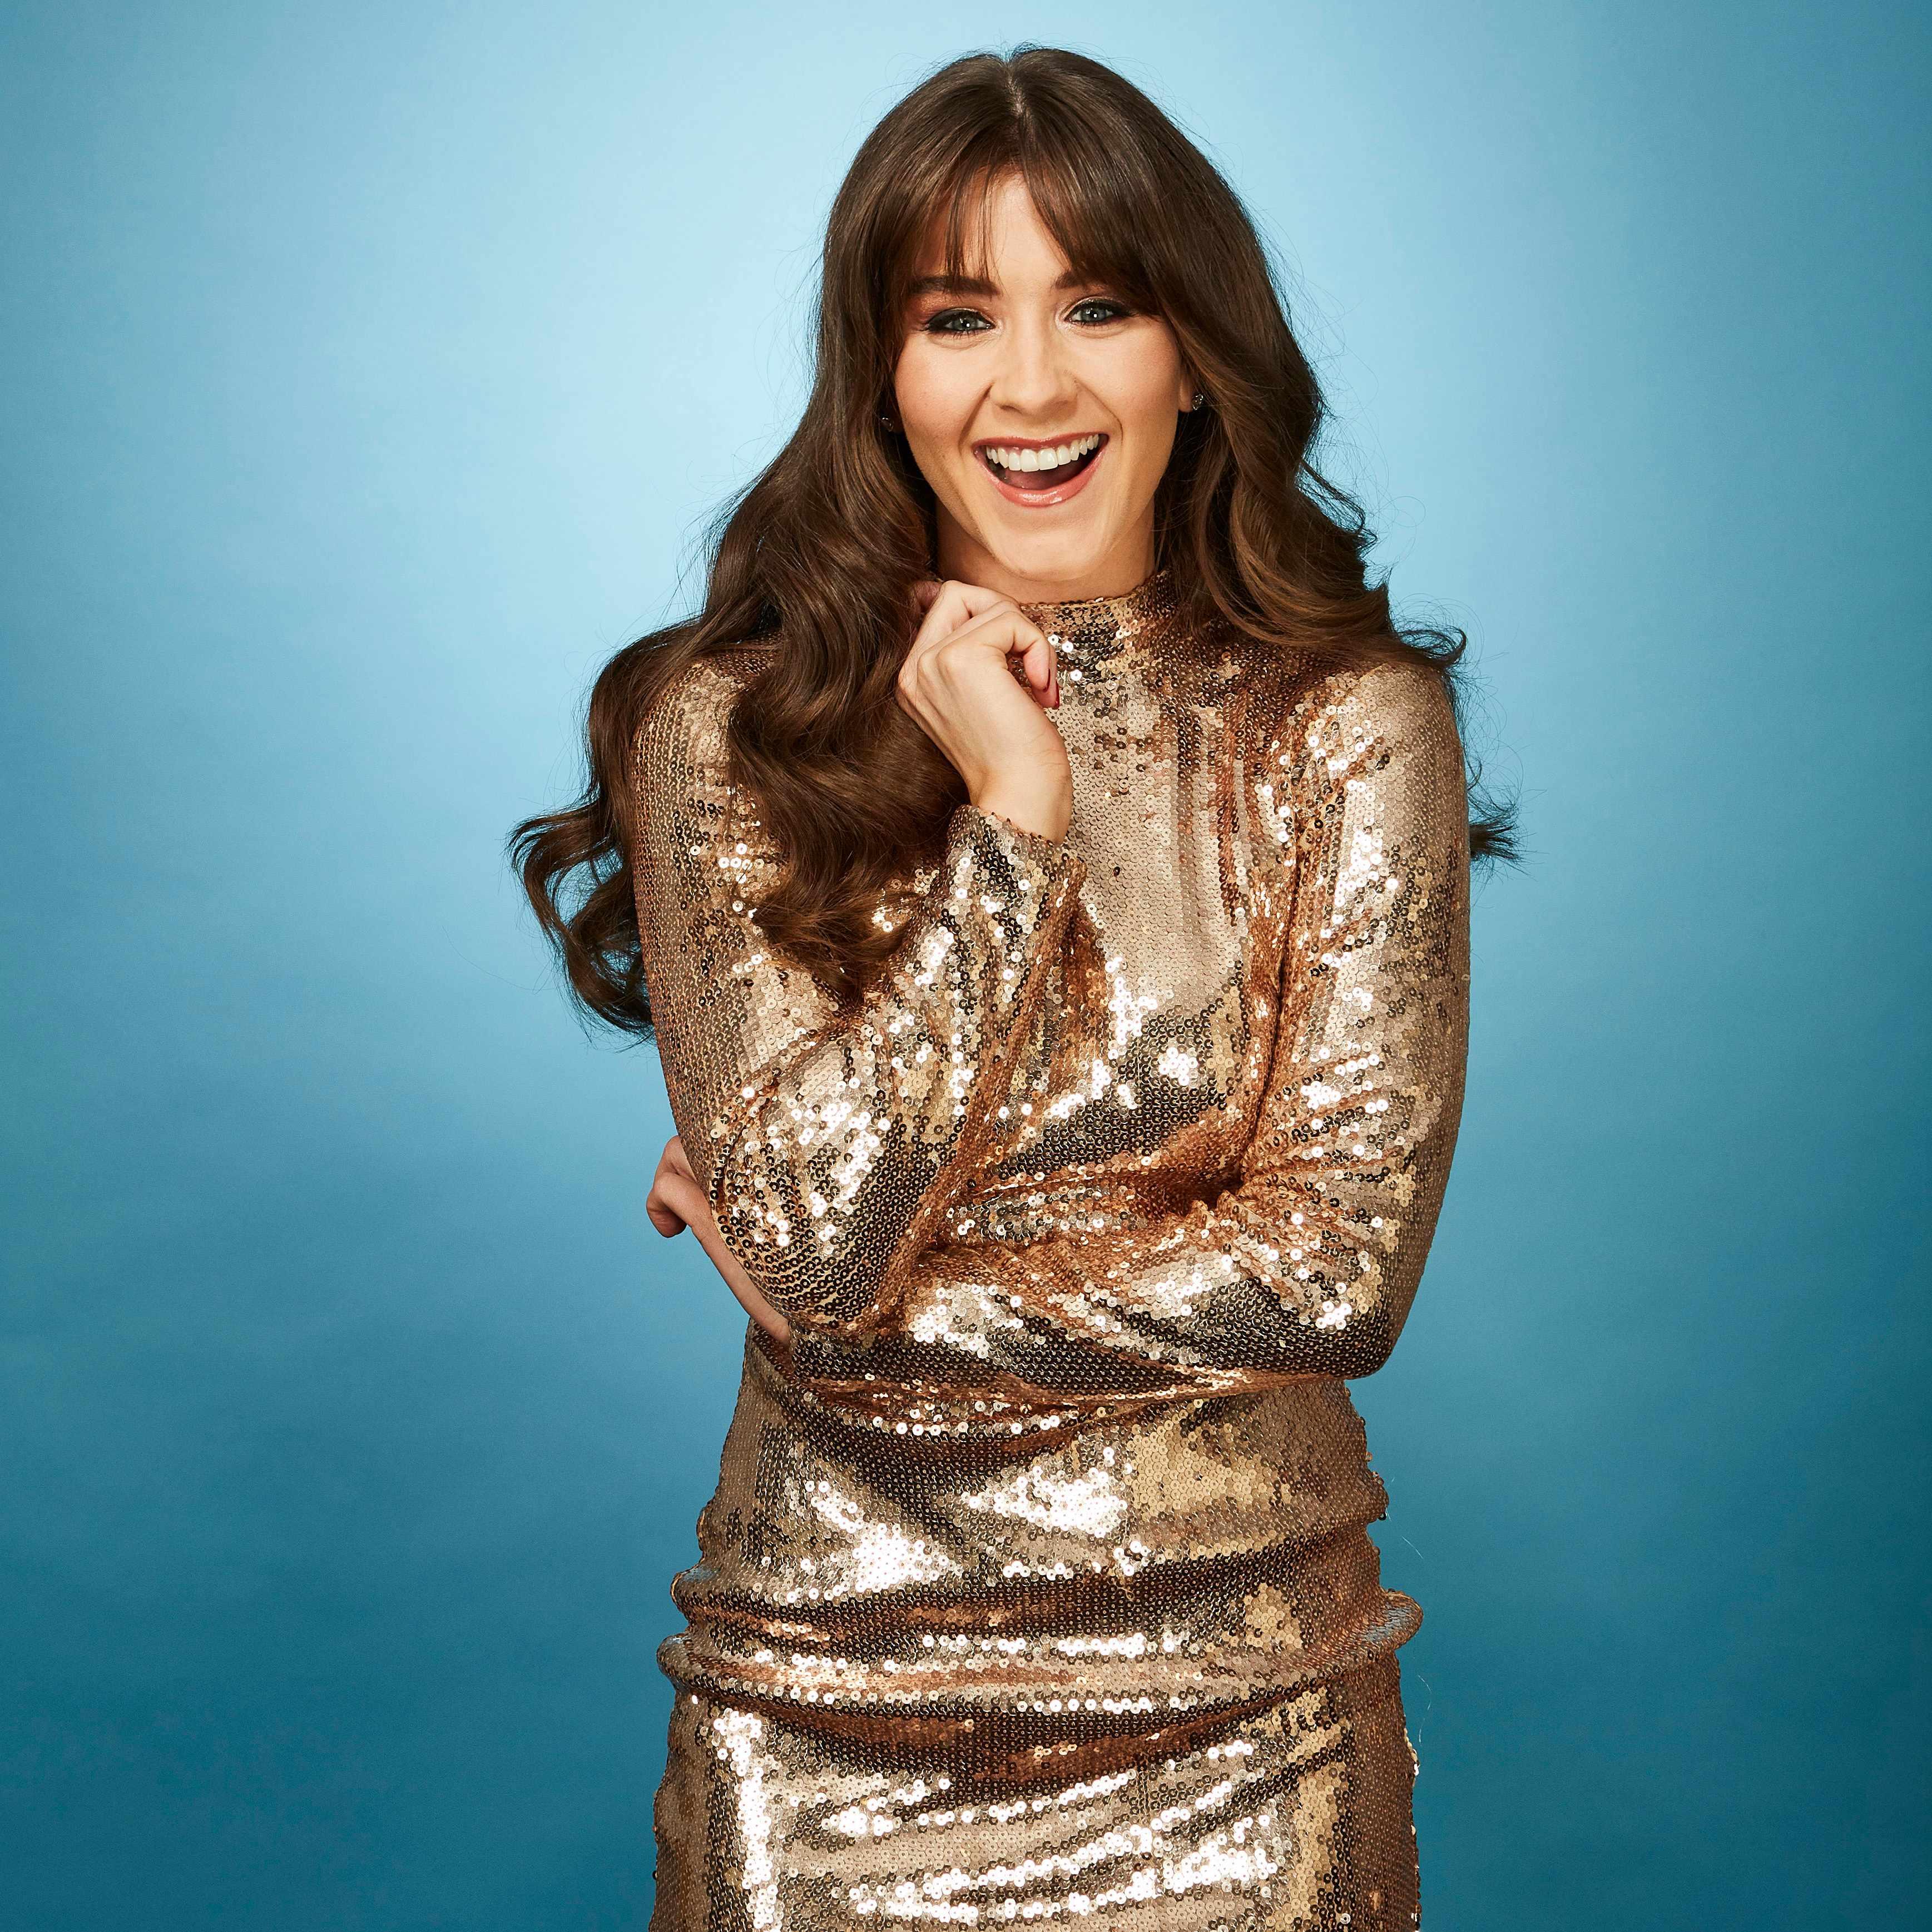 Brooke Vincent Dancing on Ice (ITV, EH)